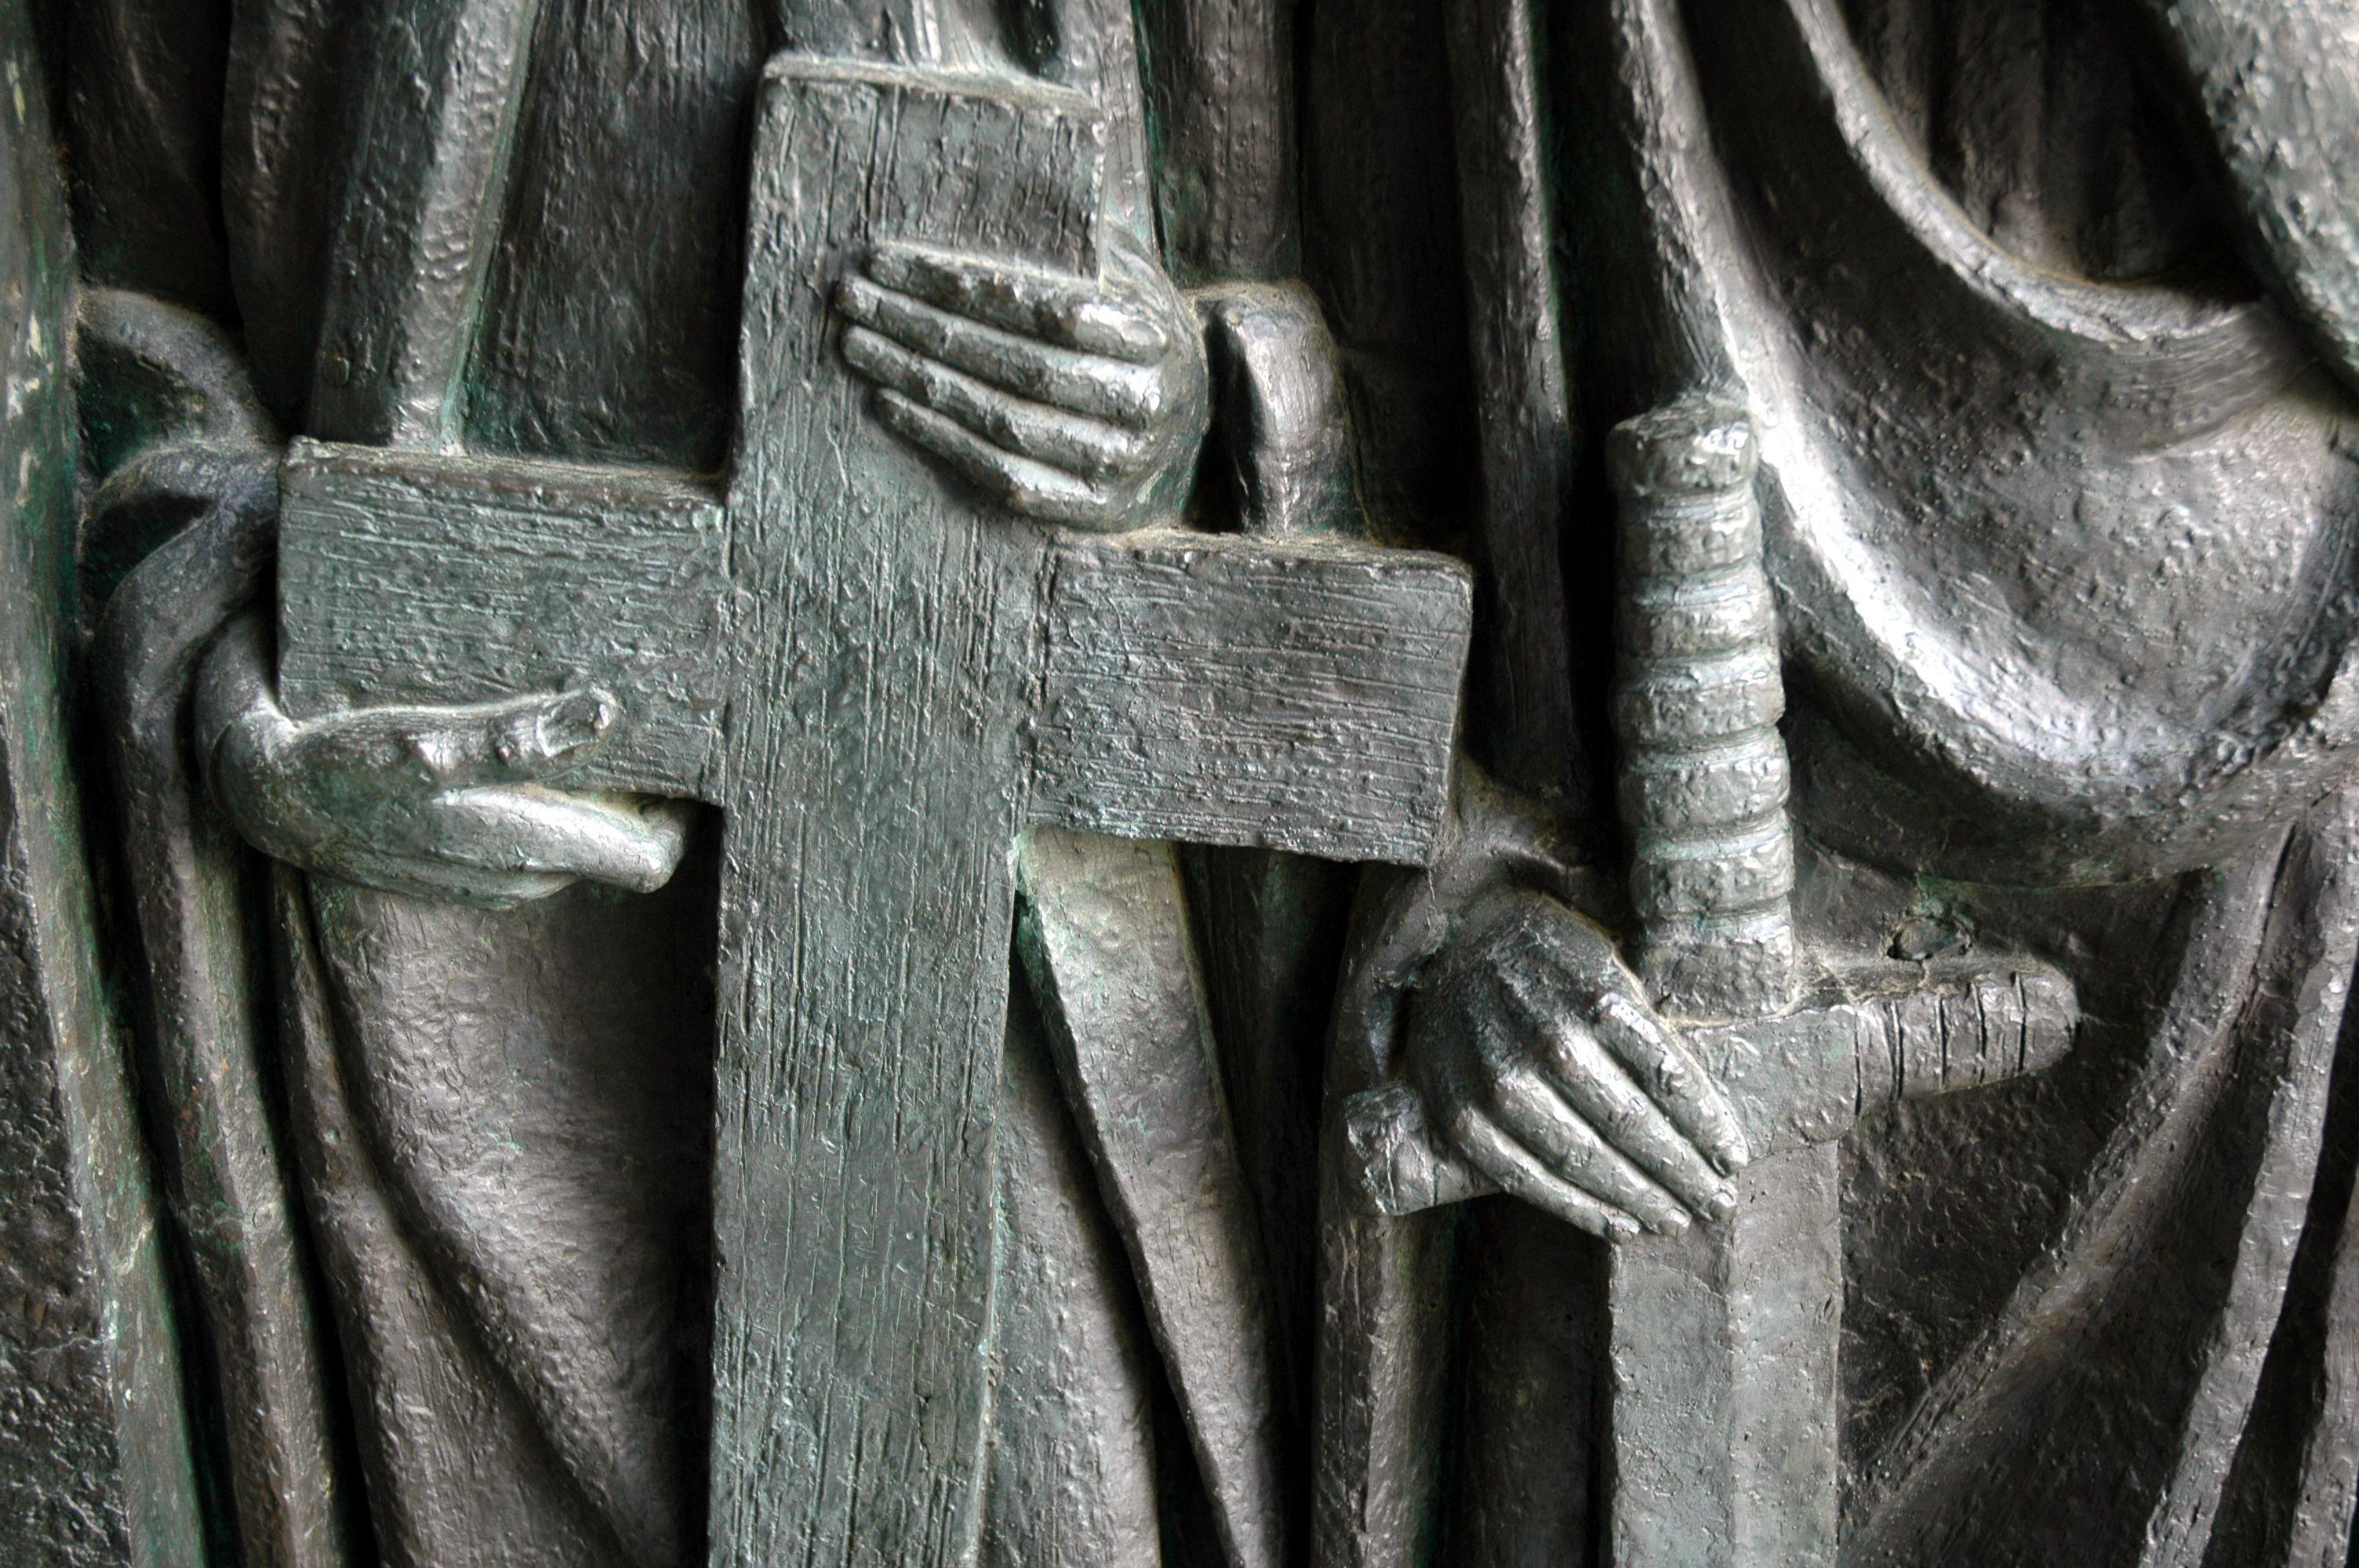 Cross and Sword